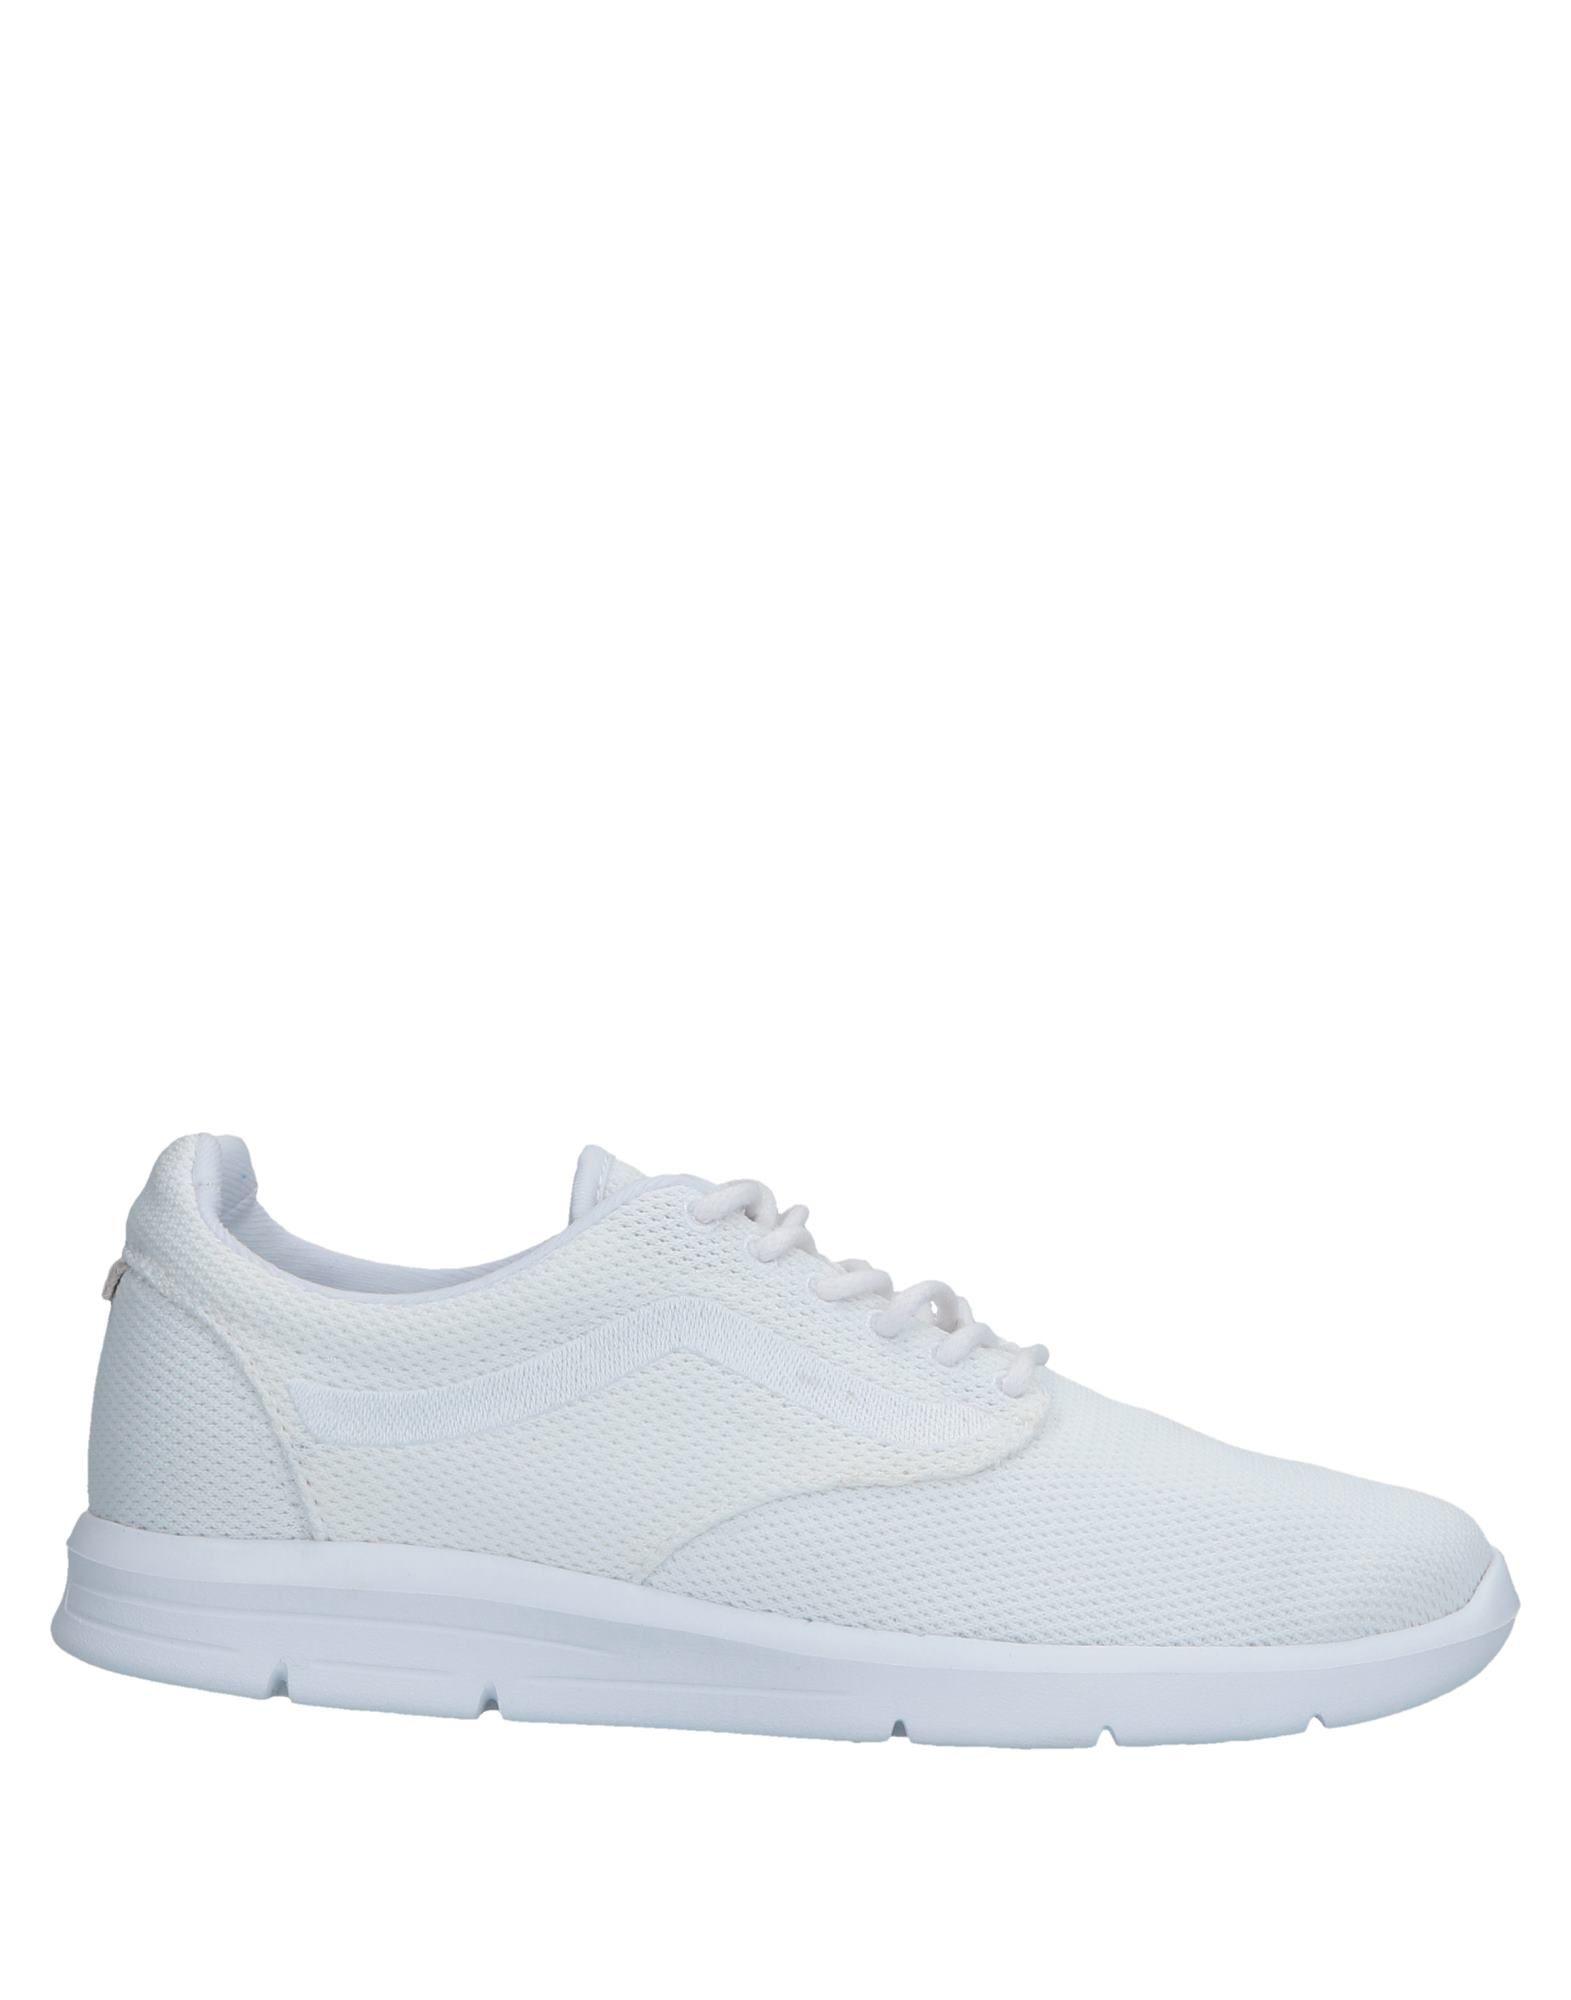 Sneakers Vans Donna - - Donna 11573779QB Scarpe comode e distintive a571f2